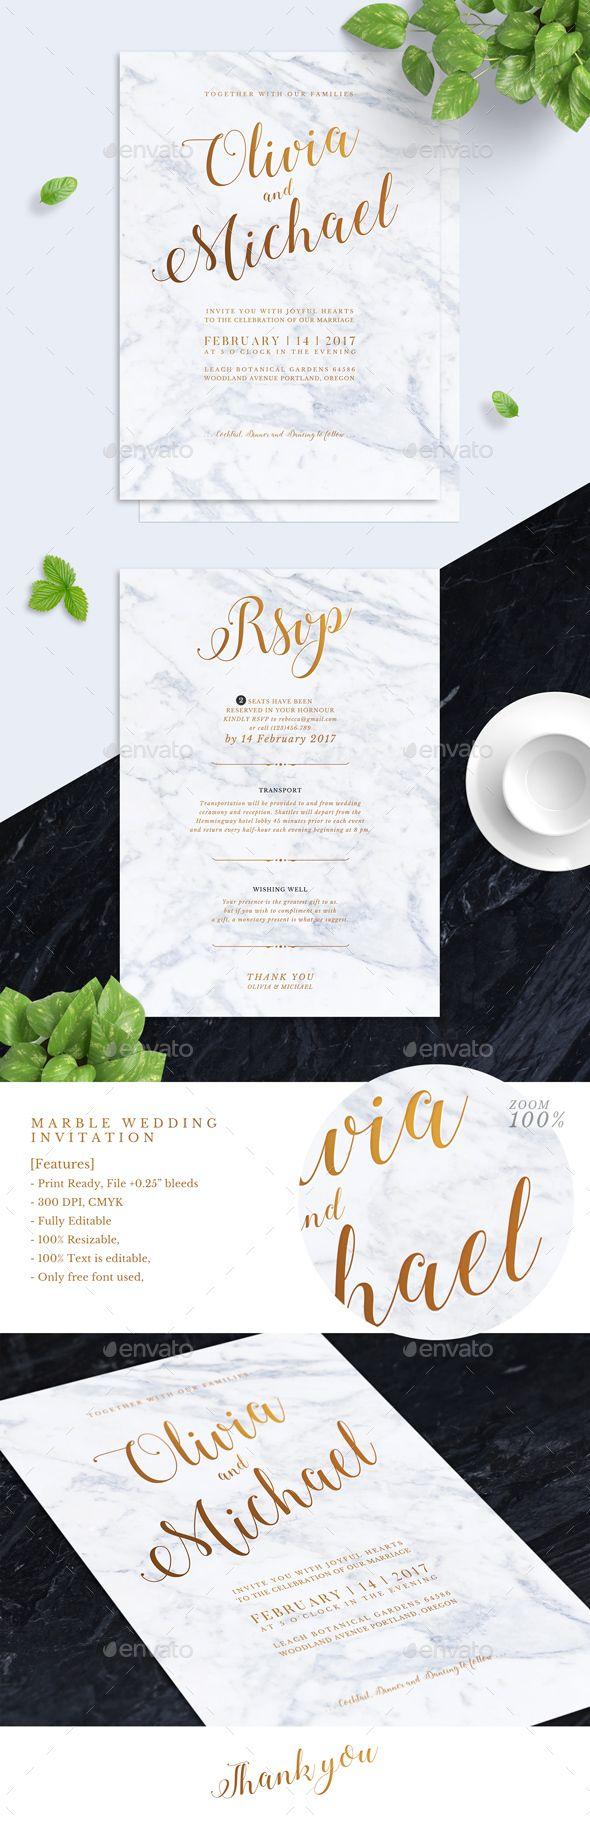 Marbel Wedding Invitation — Photoshop PSD #foil #marriage • Download ➝ https://graphicriver.net/item/marbel-wedding-invitation/18933489?ref=pxcr